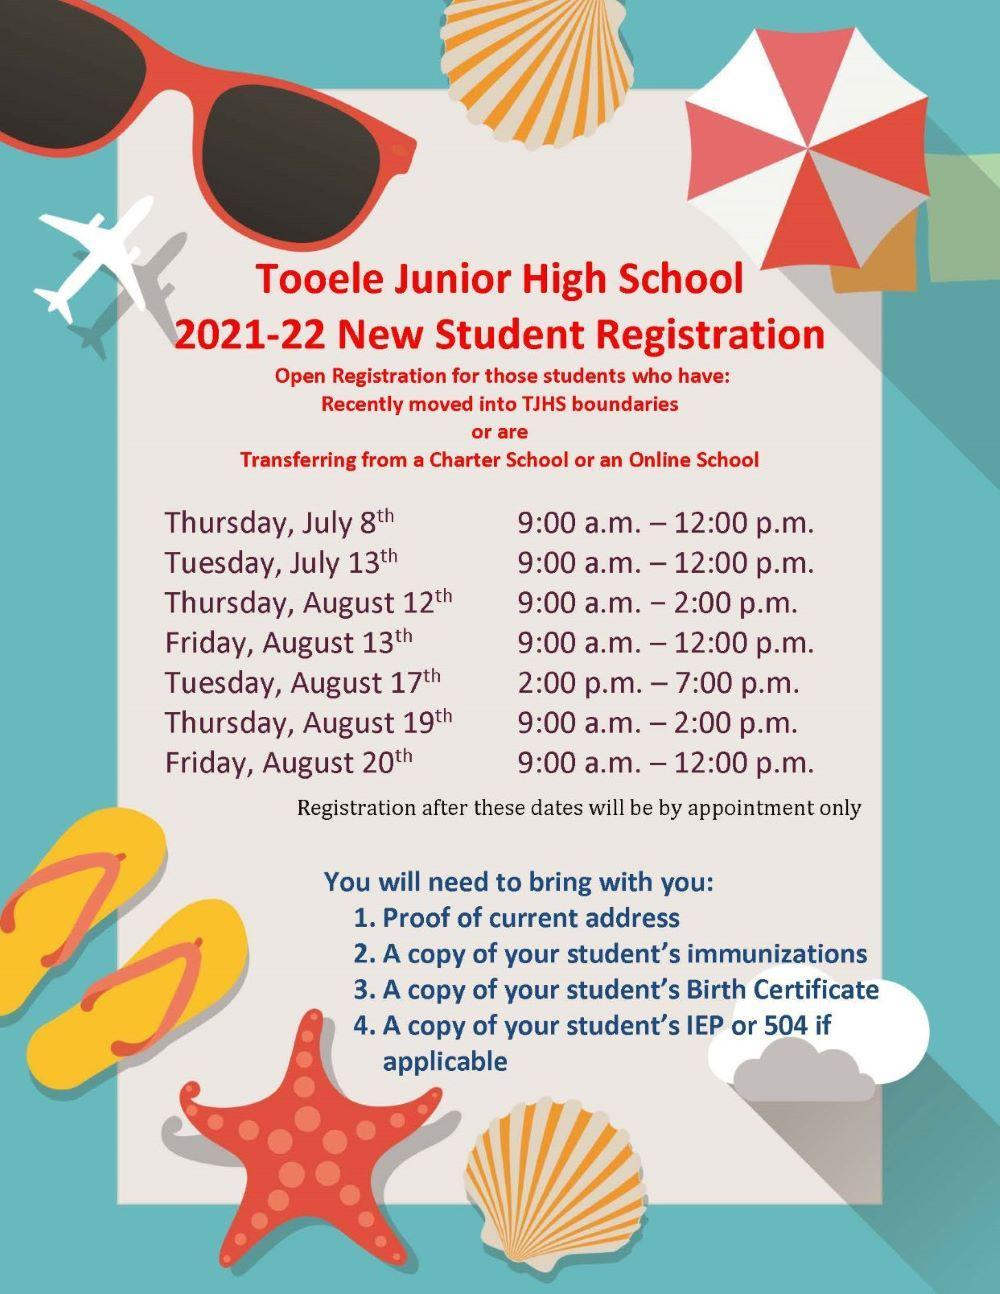 2021-22 New Student Registration